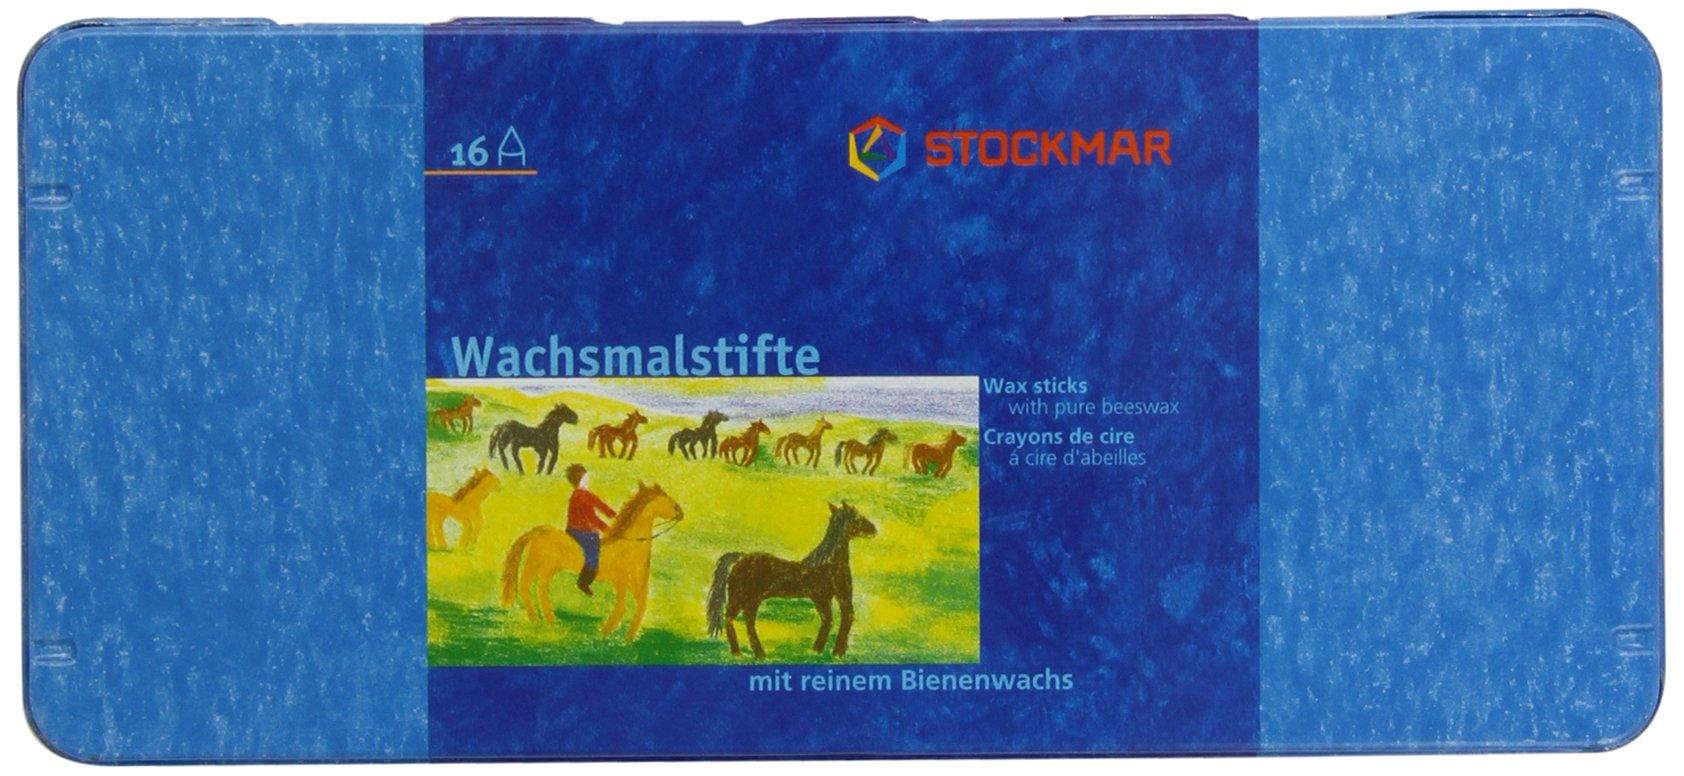 Stockmar Crayons 16 Pieces in a Tin Box